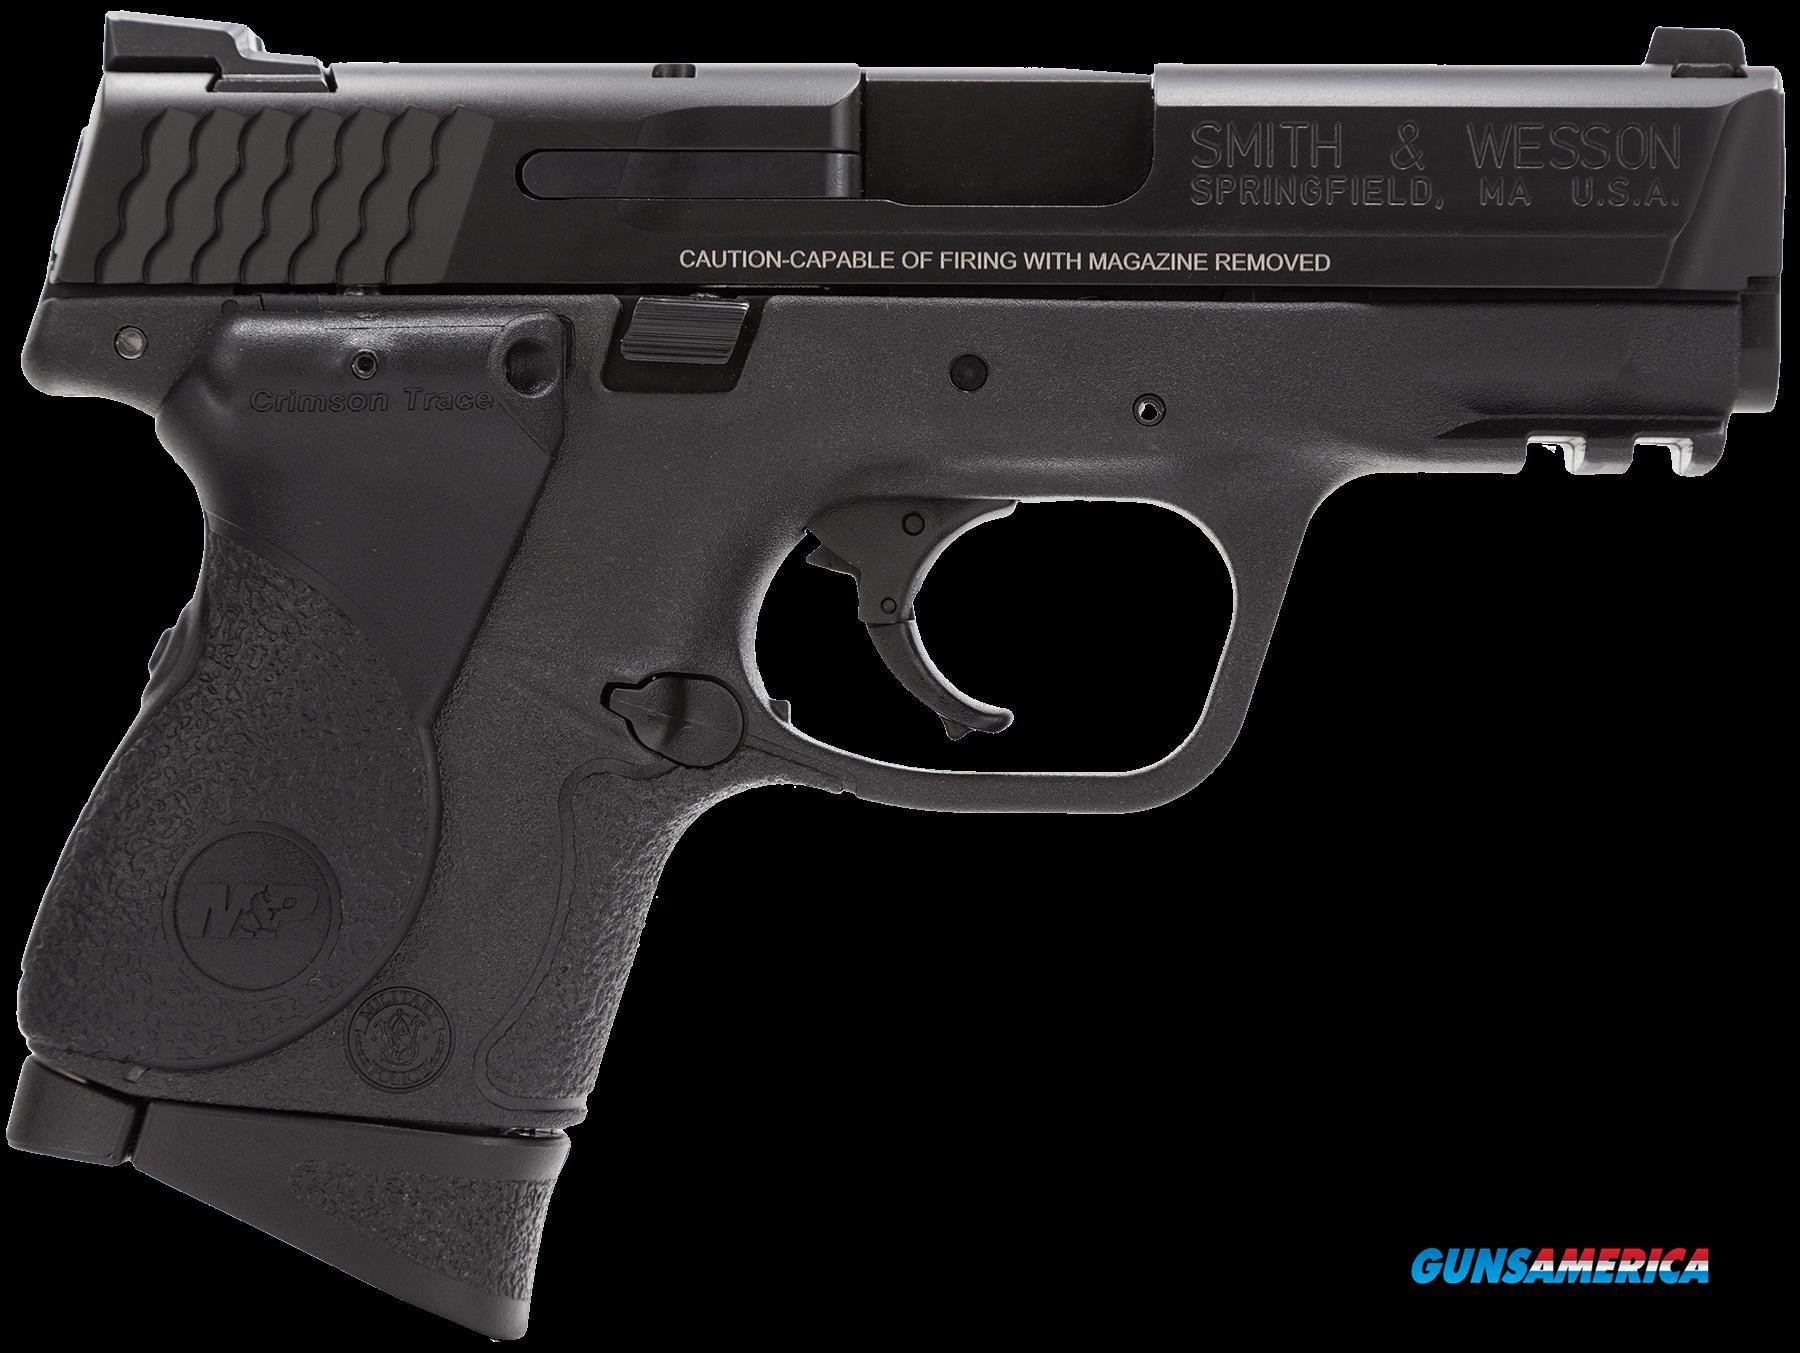 Smith & Wesson M&p 40, S&w M&p40c    120075  40 3.5 Ct               10r  Guns > Pistols > 1911 Pistol Copies (non-Colt)